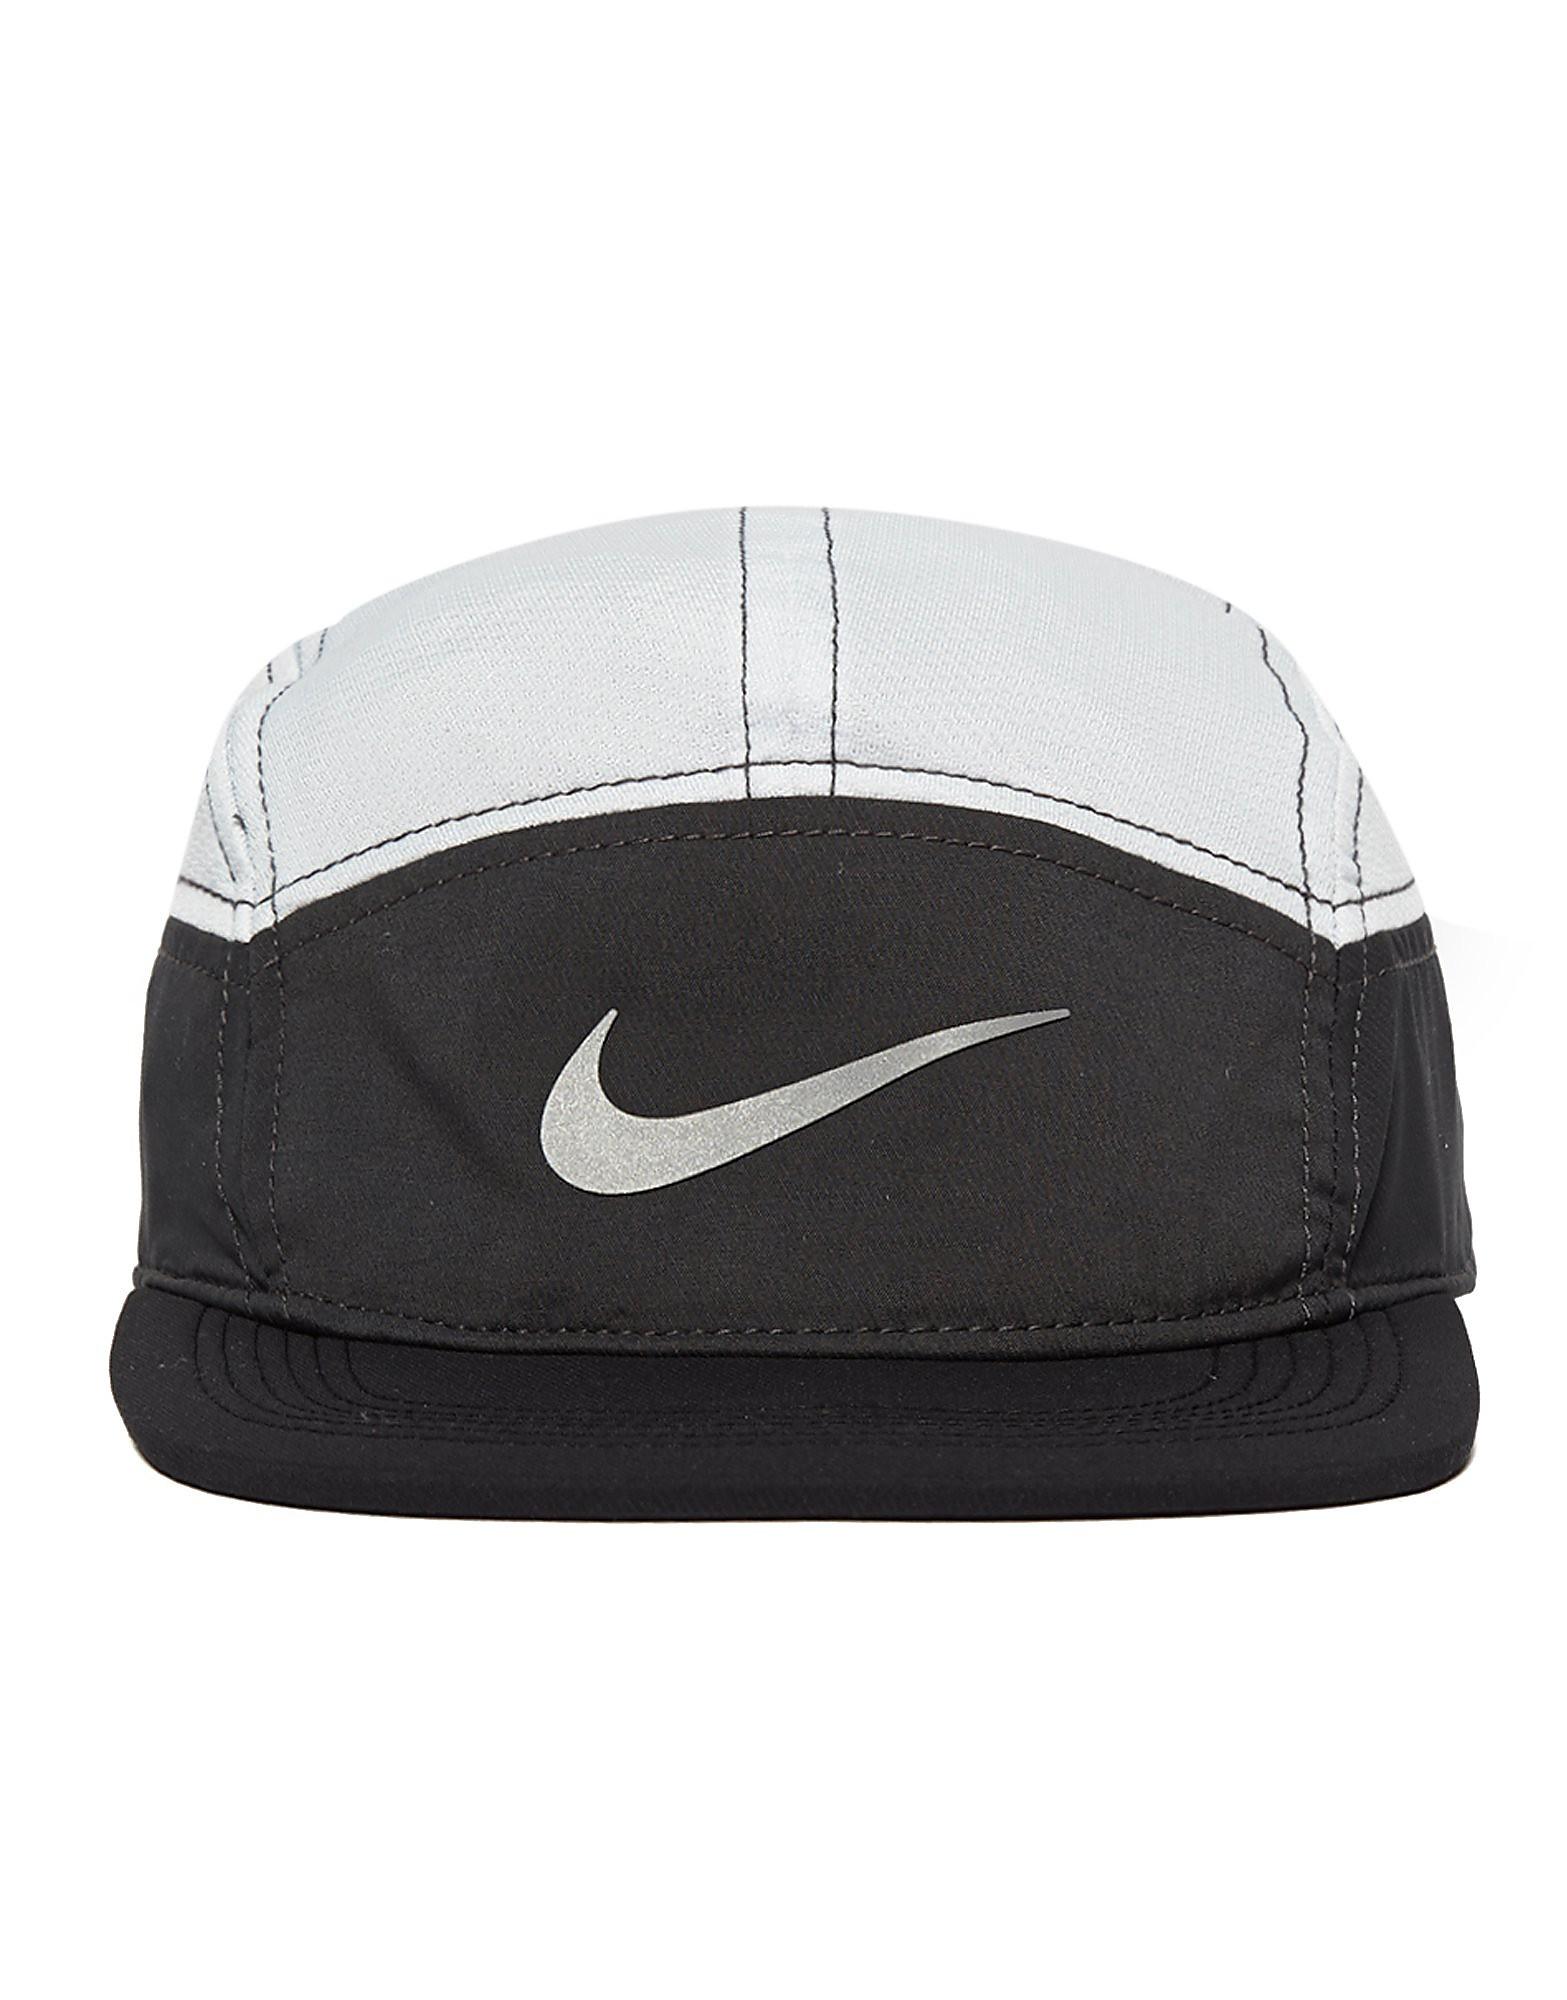 Nike AW84 Zip Cap